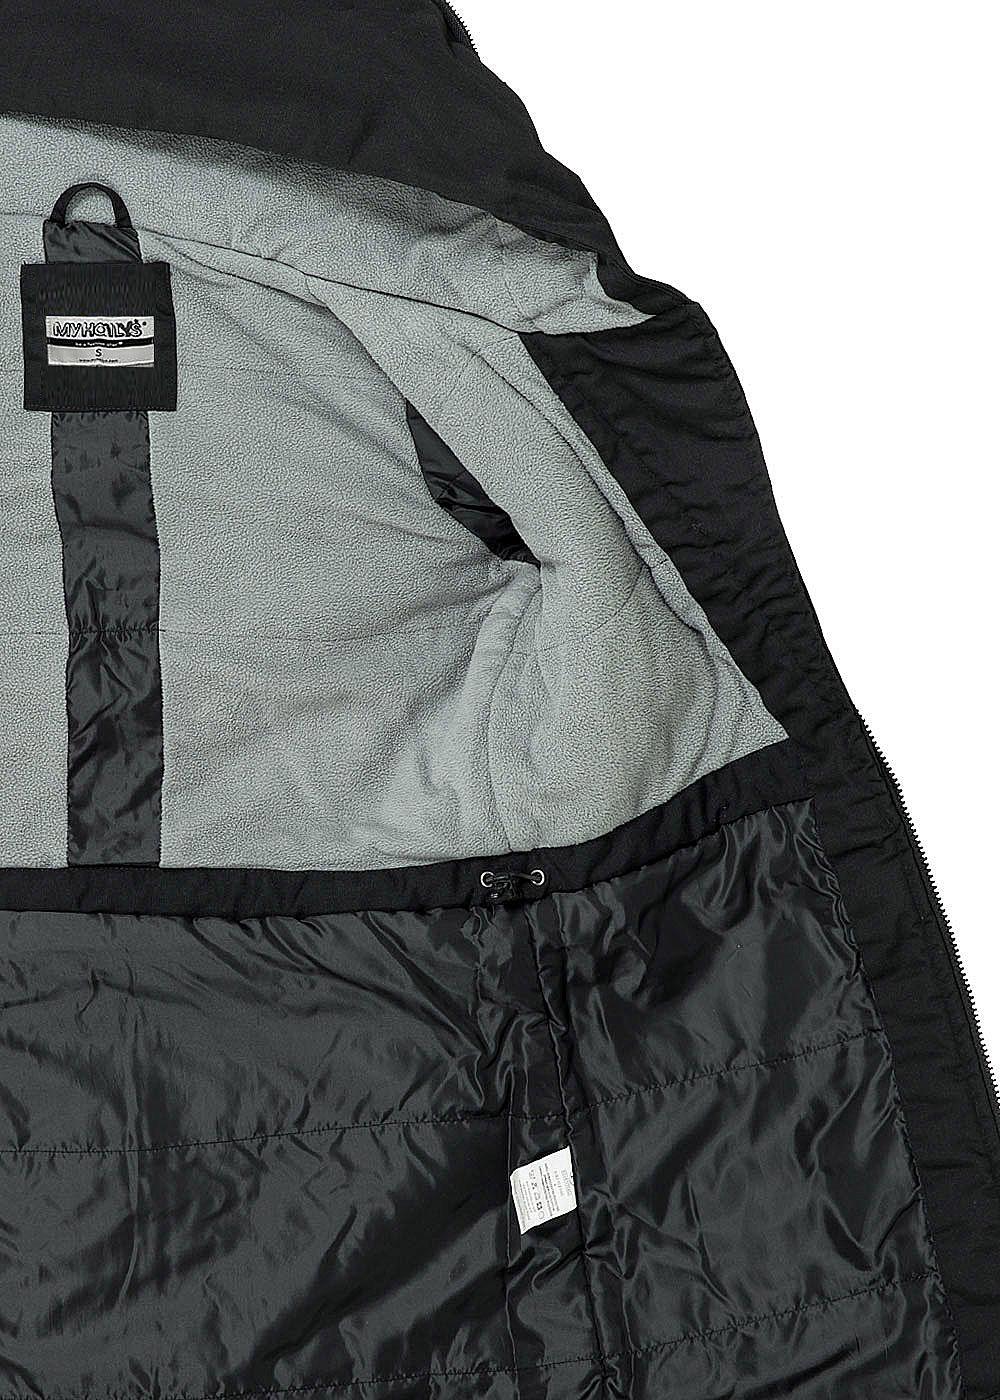 c01207b46abd Damen winterjacke fleecefutter kapuze 2 taschen schwarz – Stilvolle ...